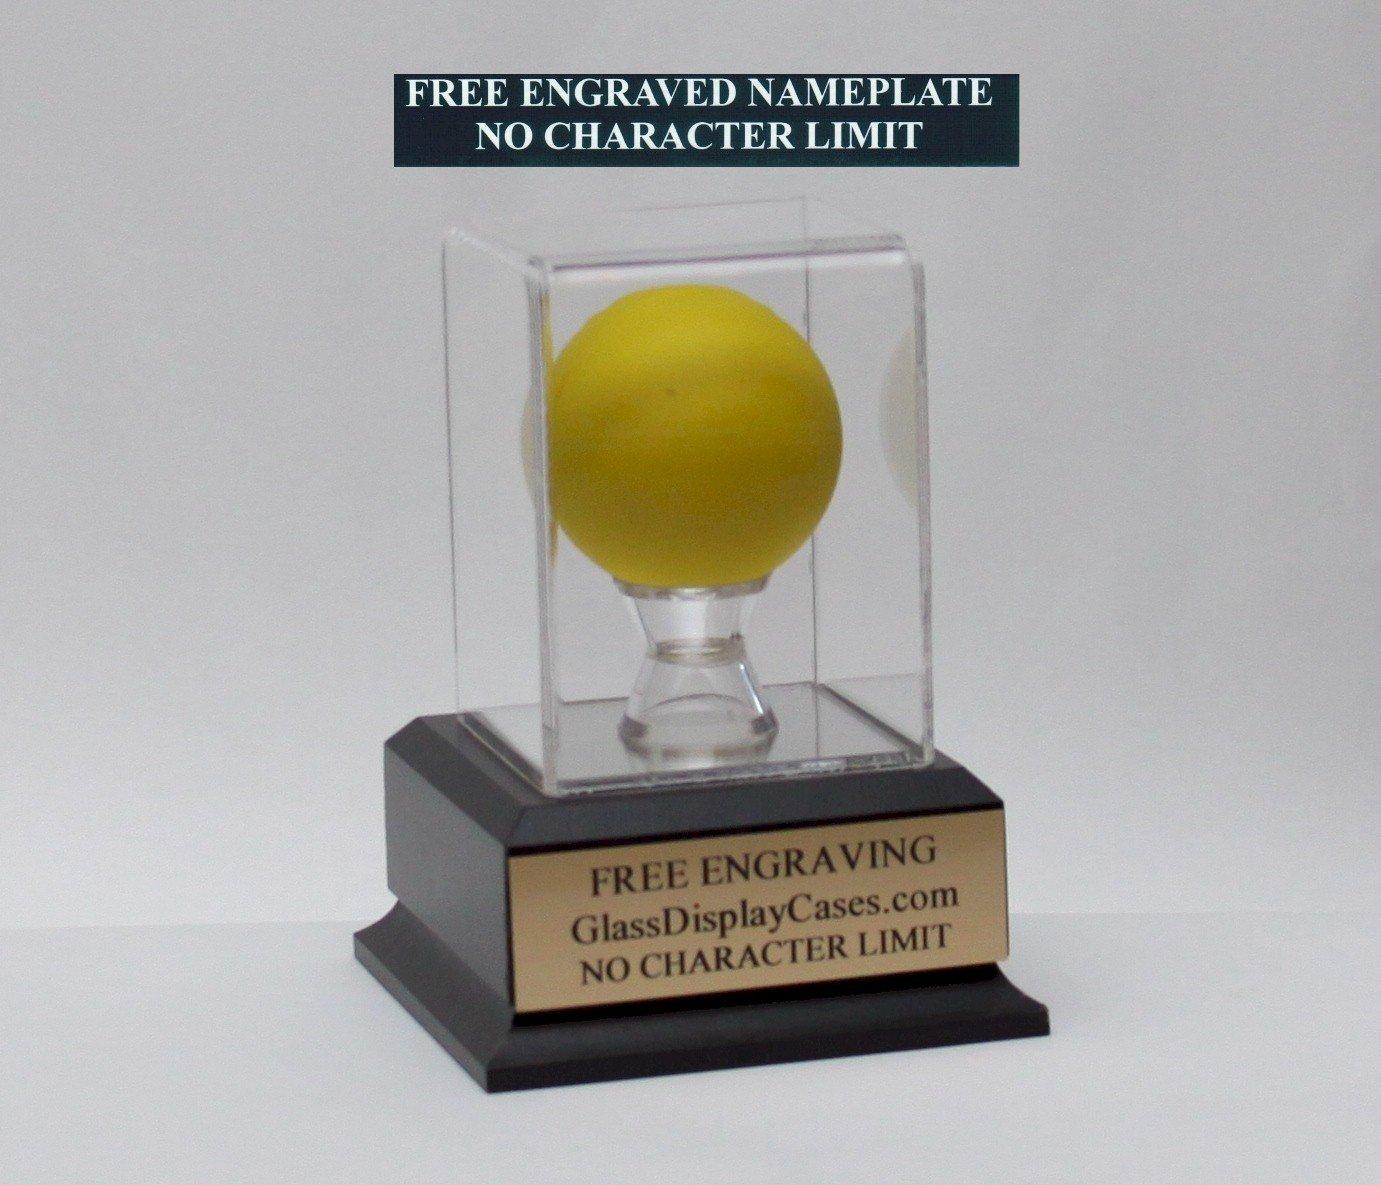 Lacrosse Ball Personalized Acrylic Display Case with Black Finish Wood Platform Base & Free Engraving